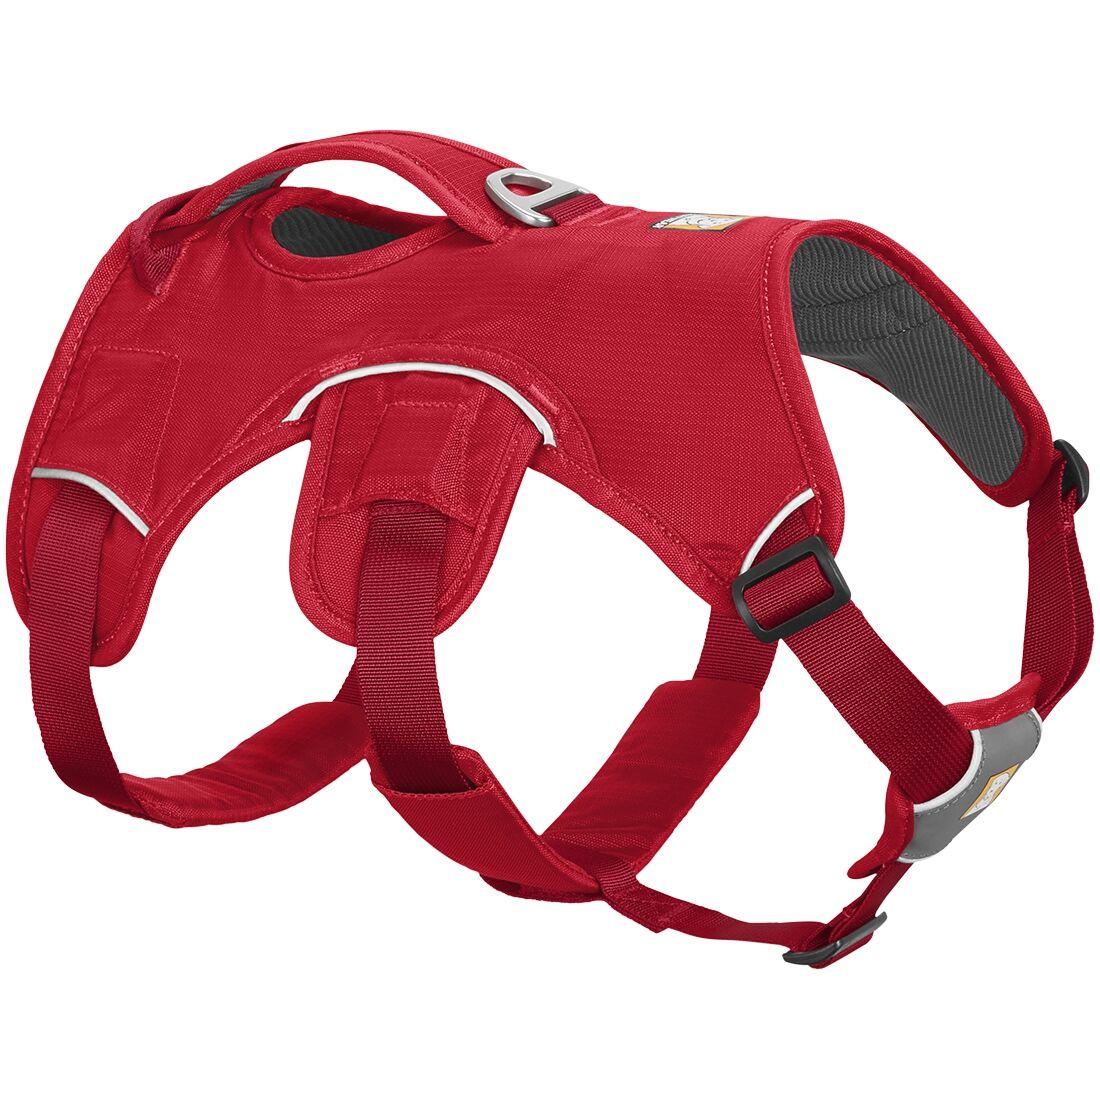 Ruffwear Harnais pour chien Ruffwear Web Master rouge Taille : S